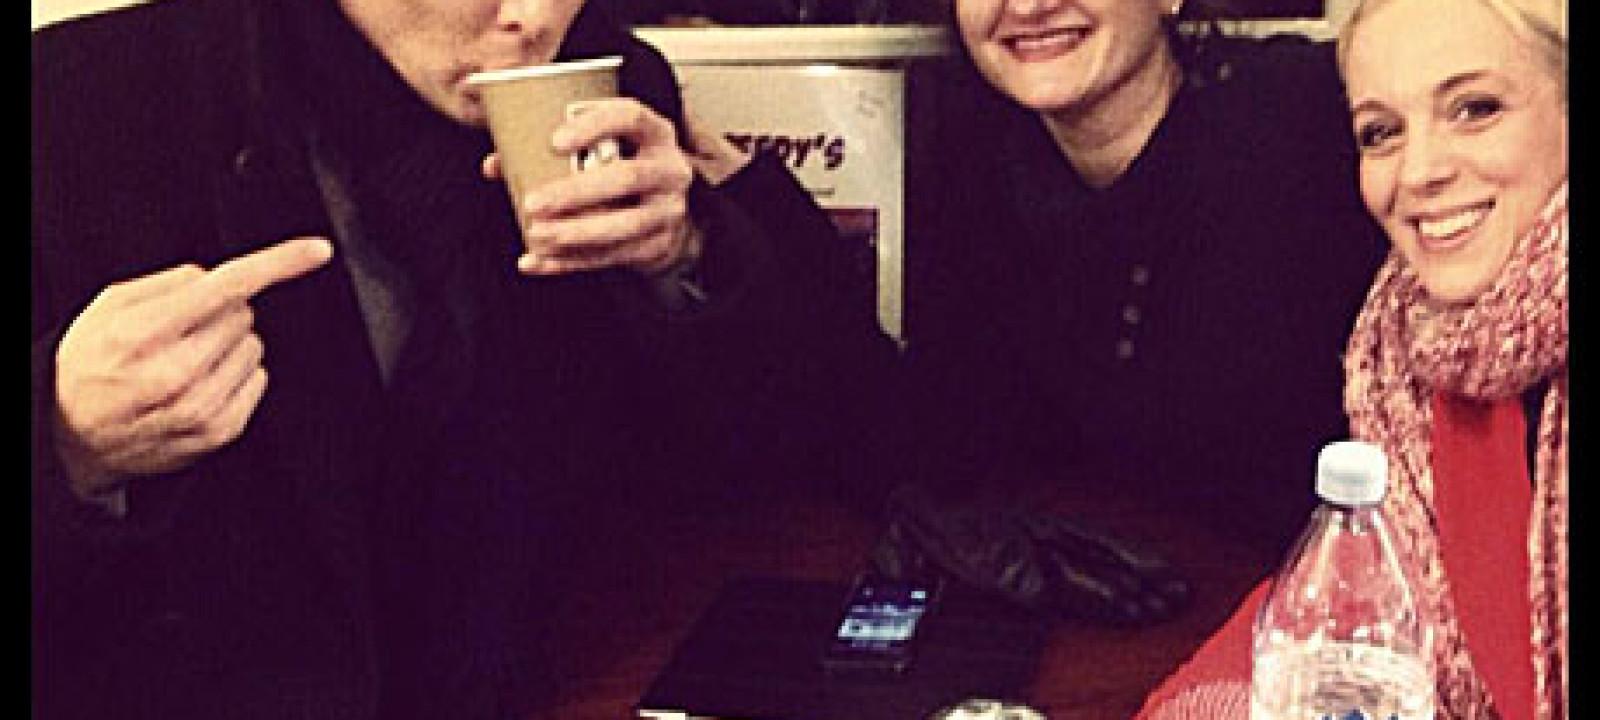 Benedict Cumberbatch in Speedy's Cafe